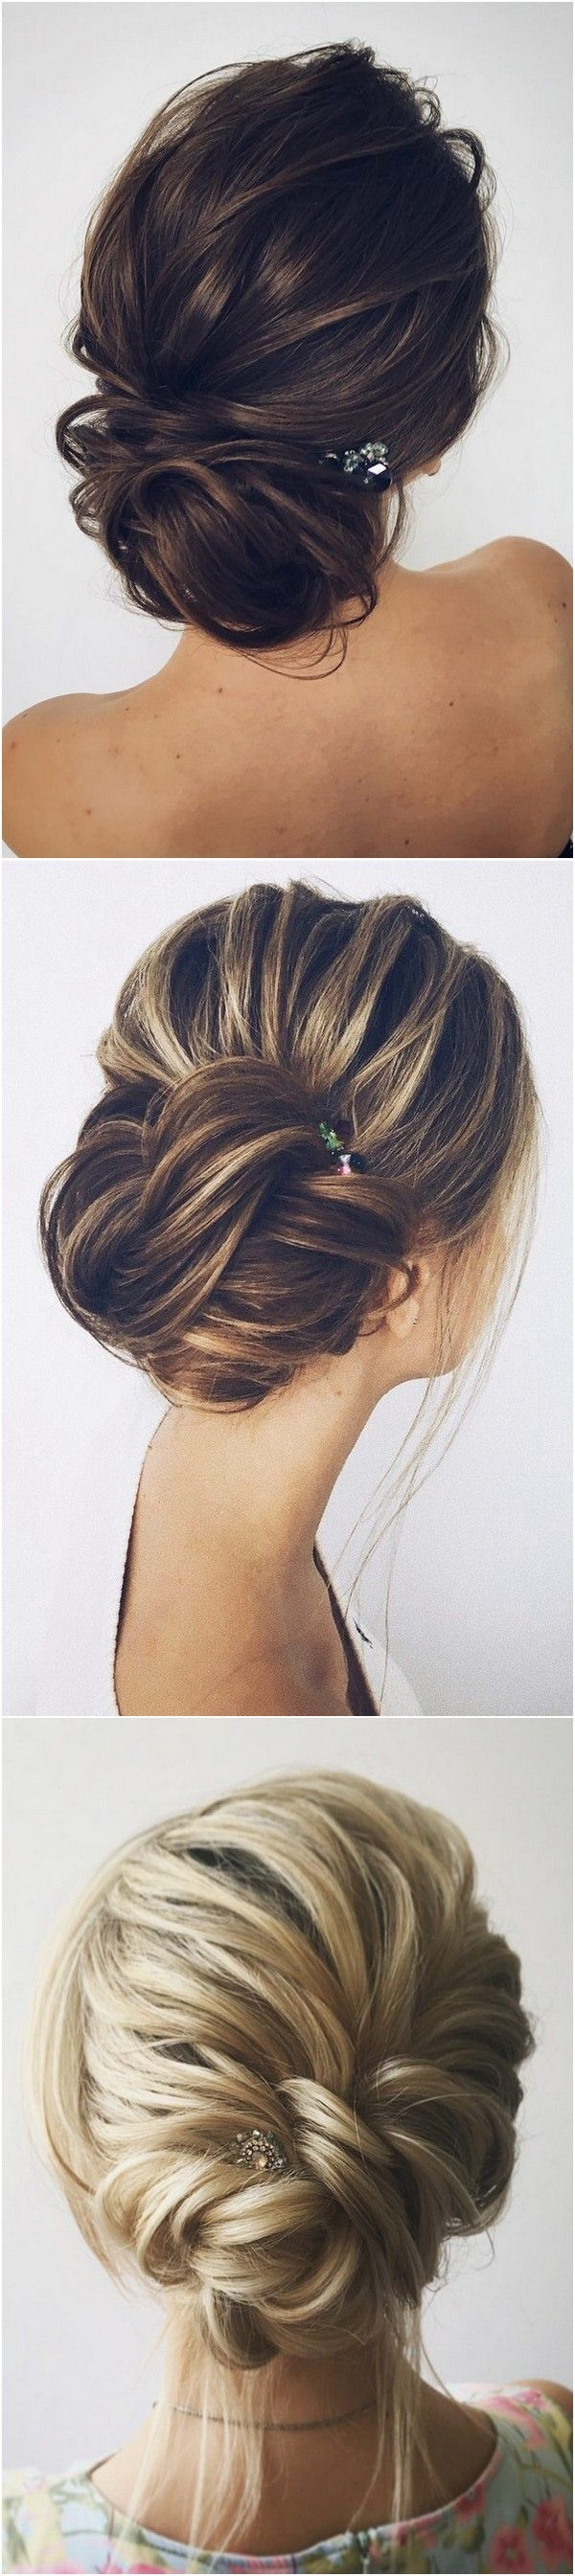 trending updo wedding hairstyles from instagram fishtail updo